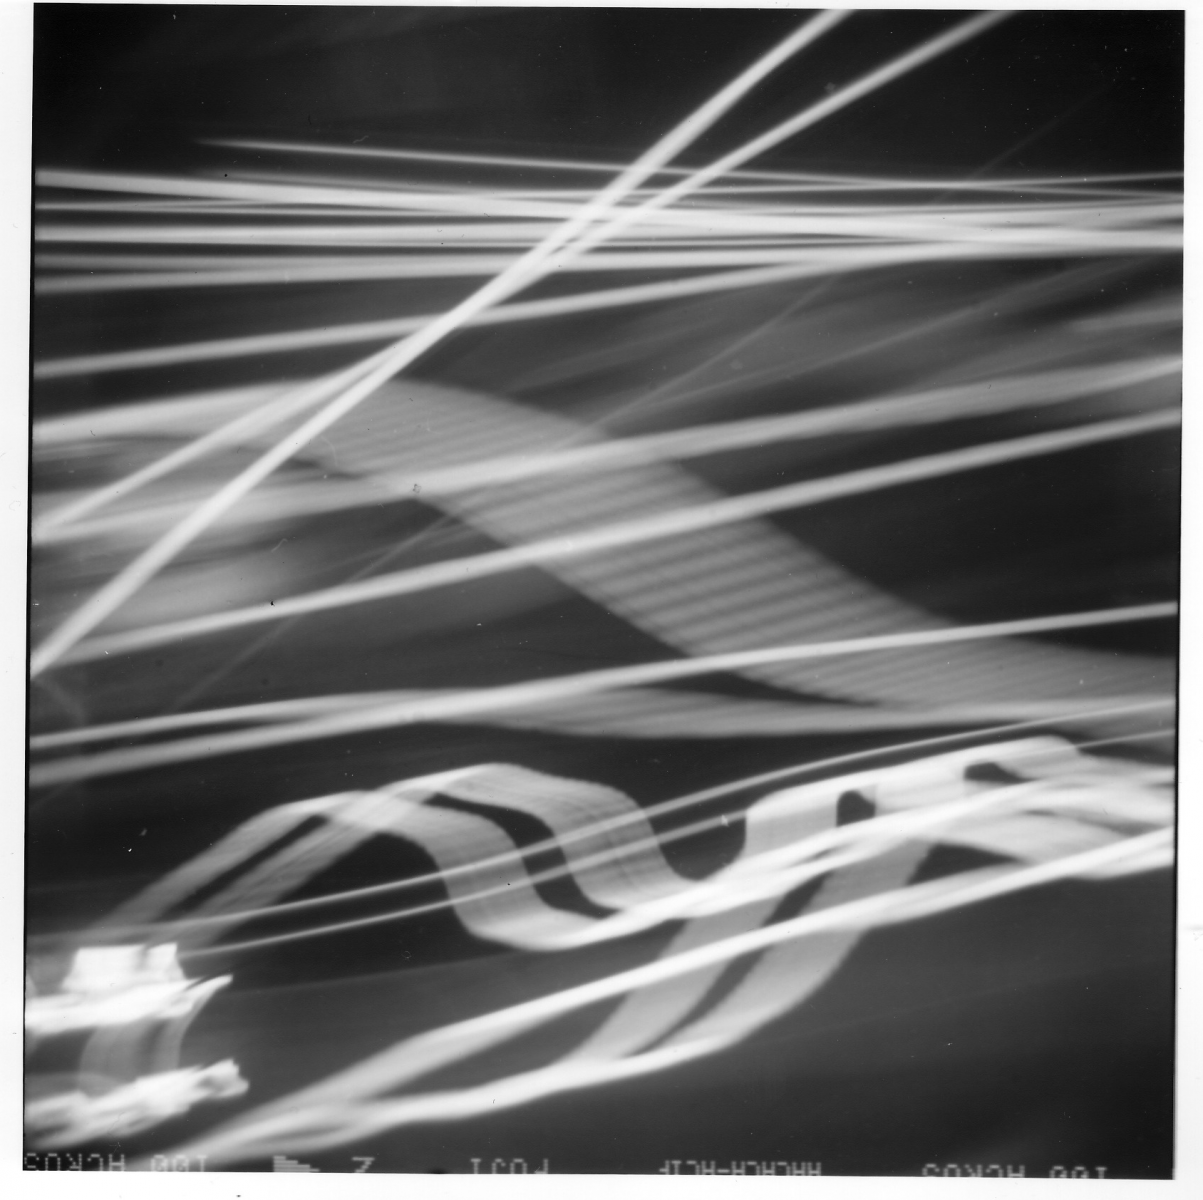 motographies-tirage_0001